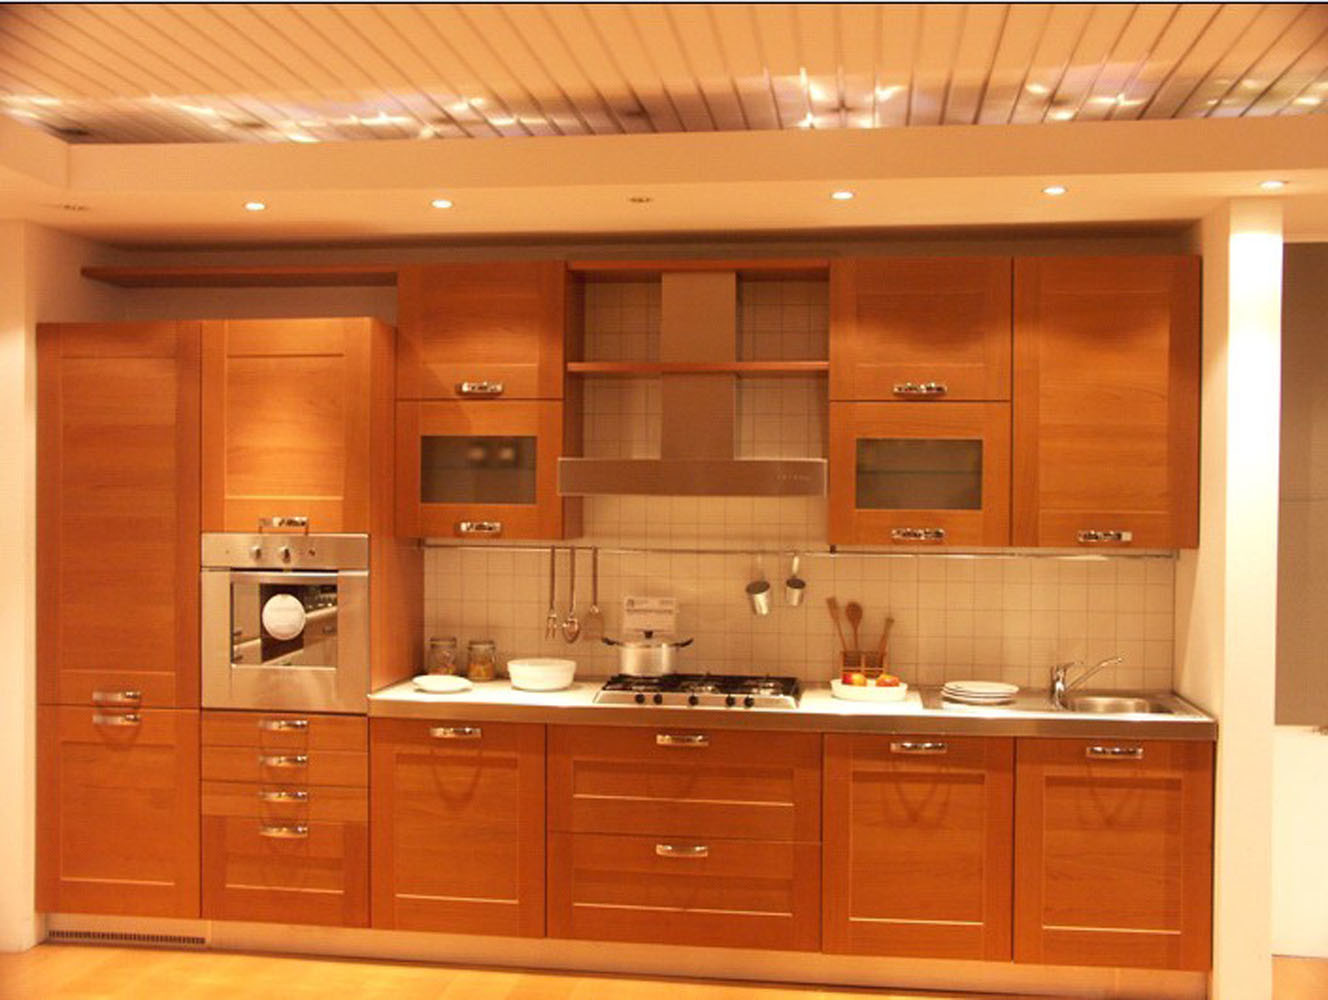 Foto de roble rojo arce gabinetes de cocina de madera for A one kitchen cabinets ltd